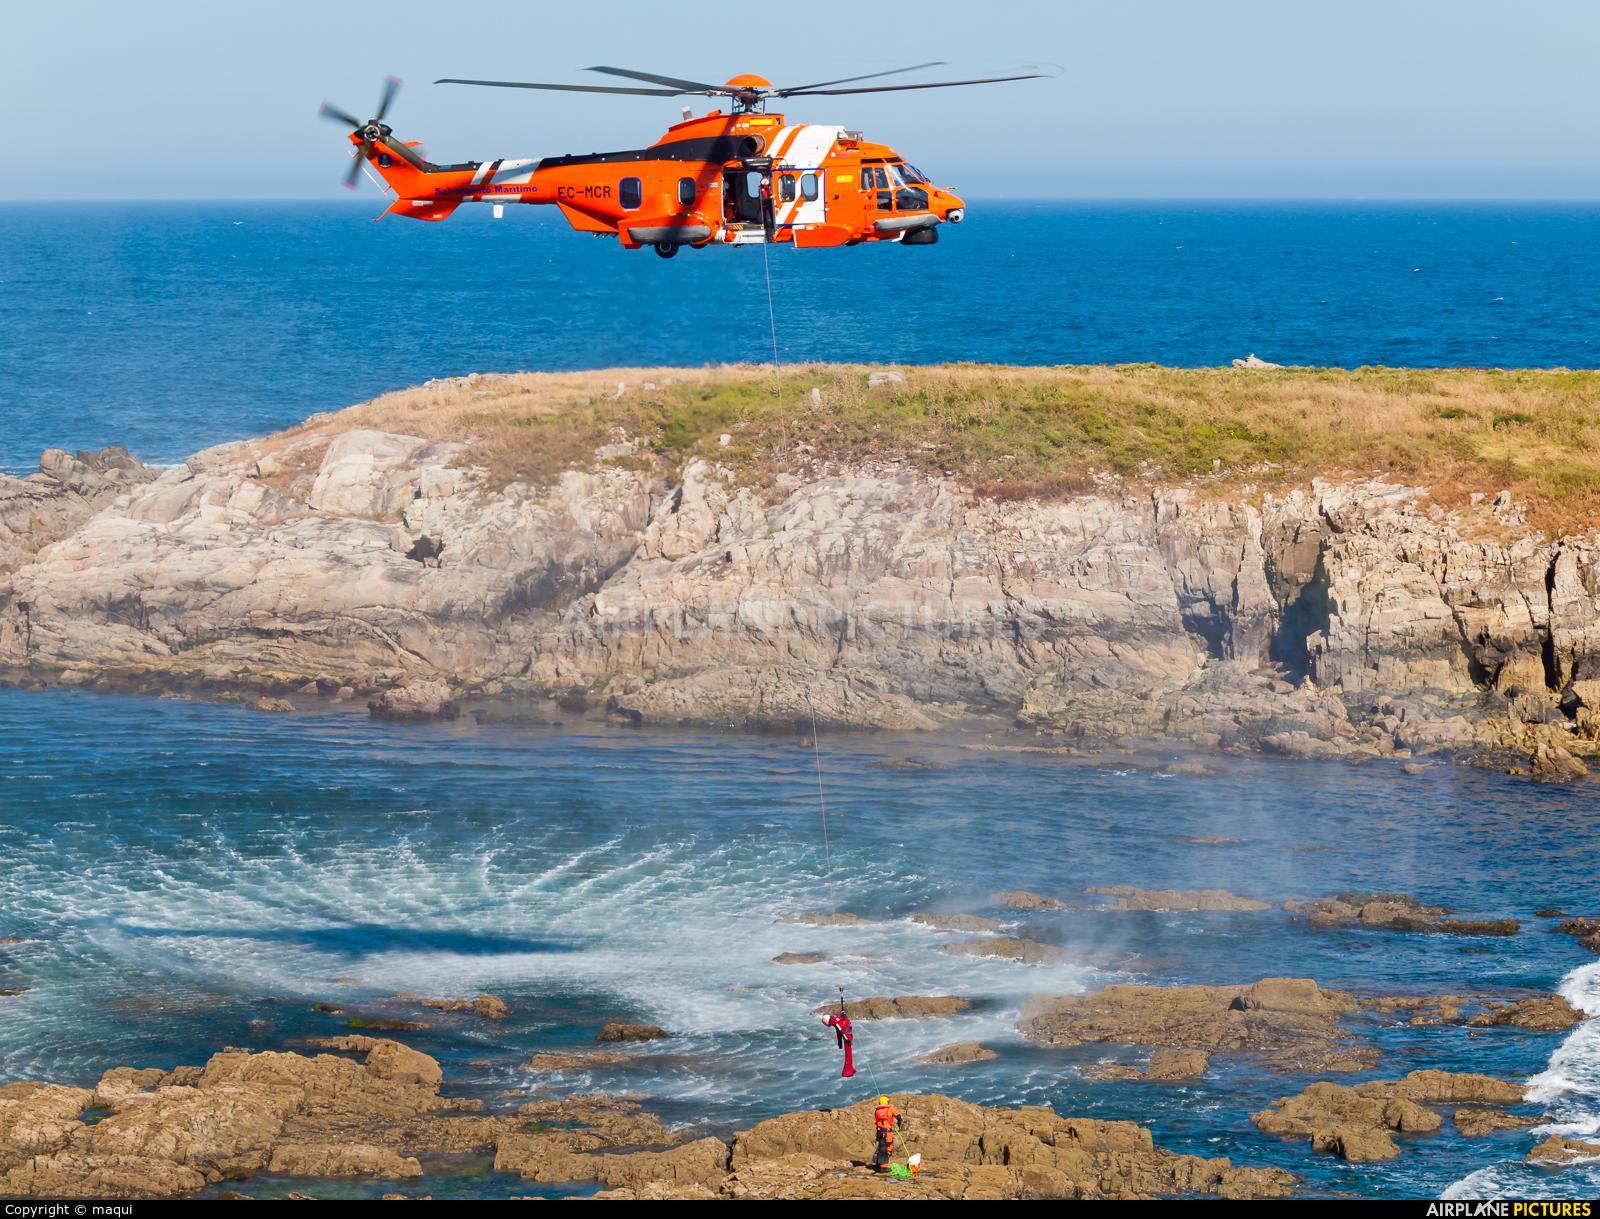 Spain - Coast Guard EC-MCR aircraft at La Coruña - El Portiño